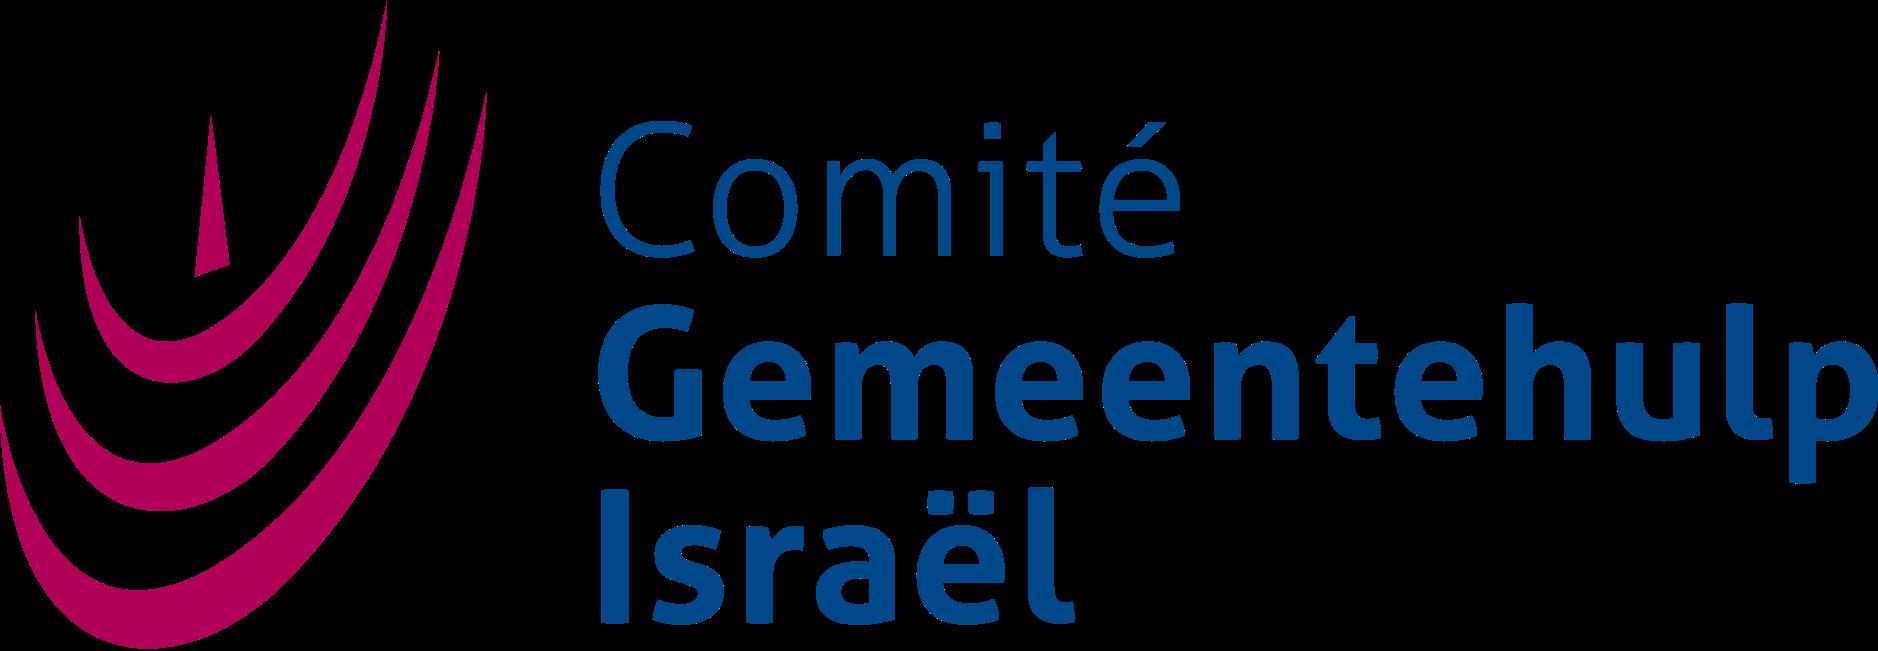 Comité Gemeentehulp Israël